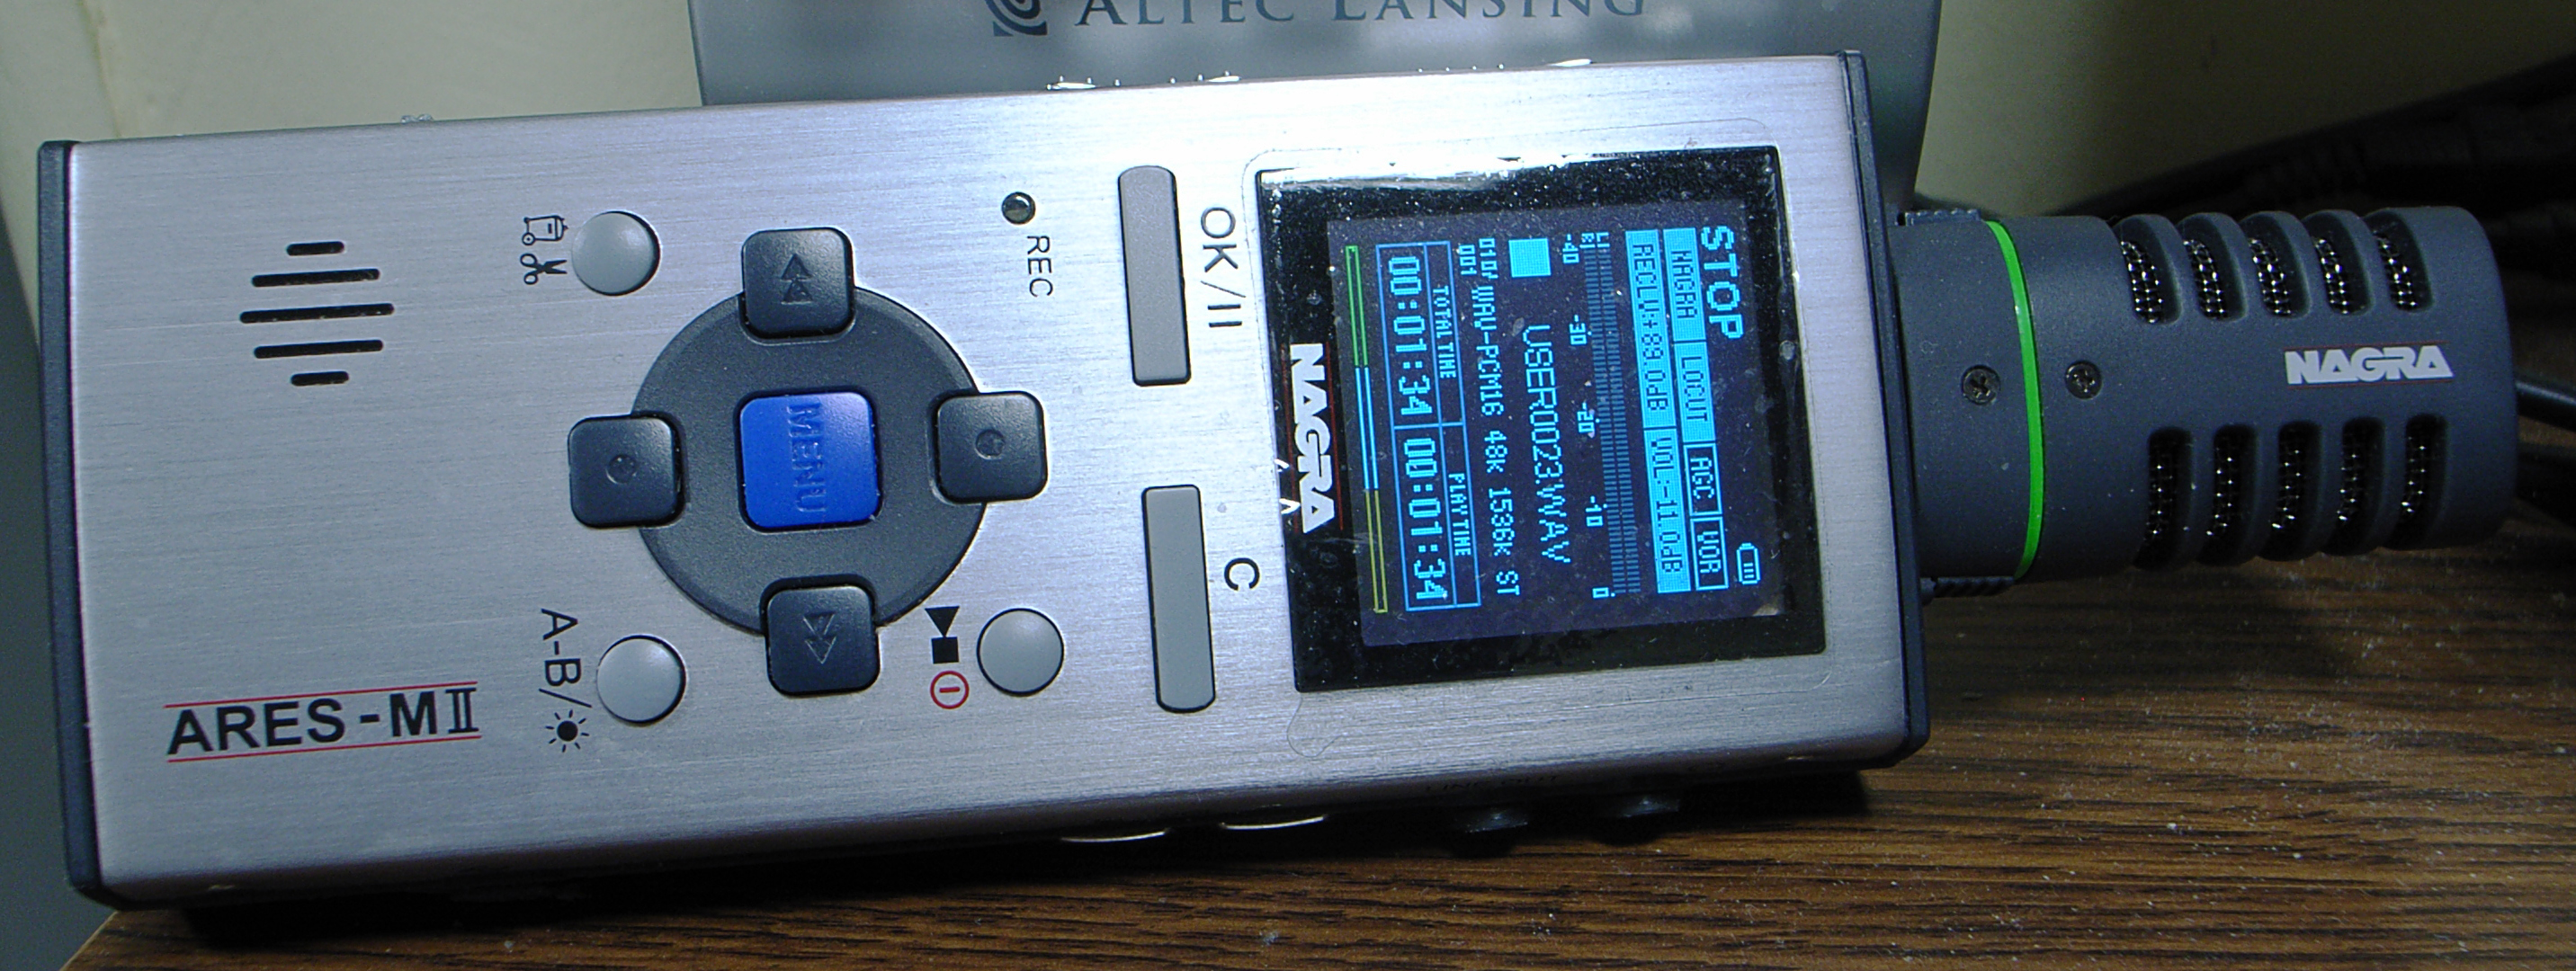 nagra ares m ii image 930221 audiofanzine rh en audiofanzine com Operators Manual User Guide